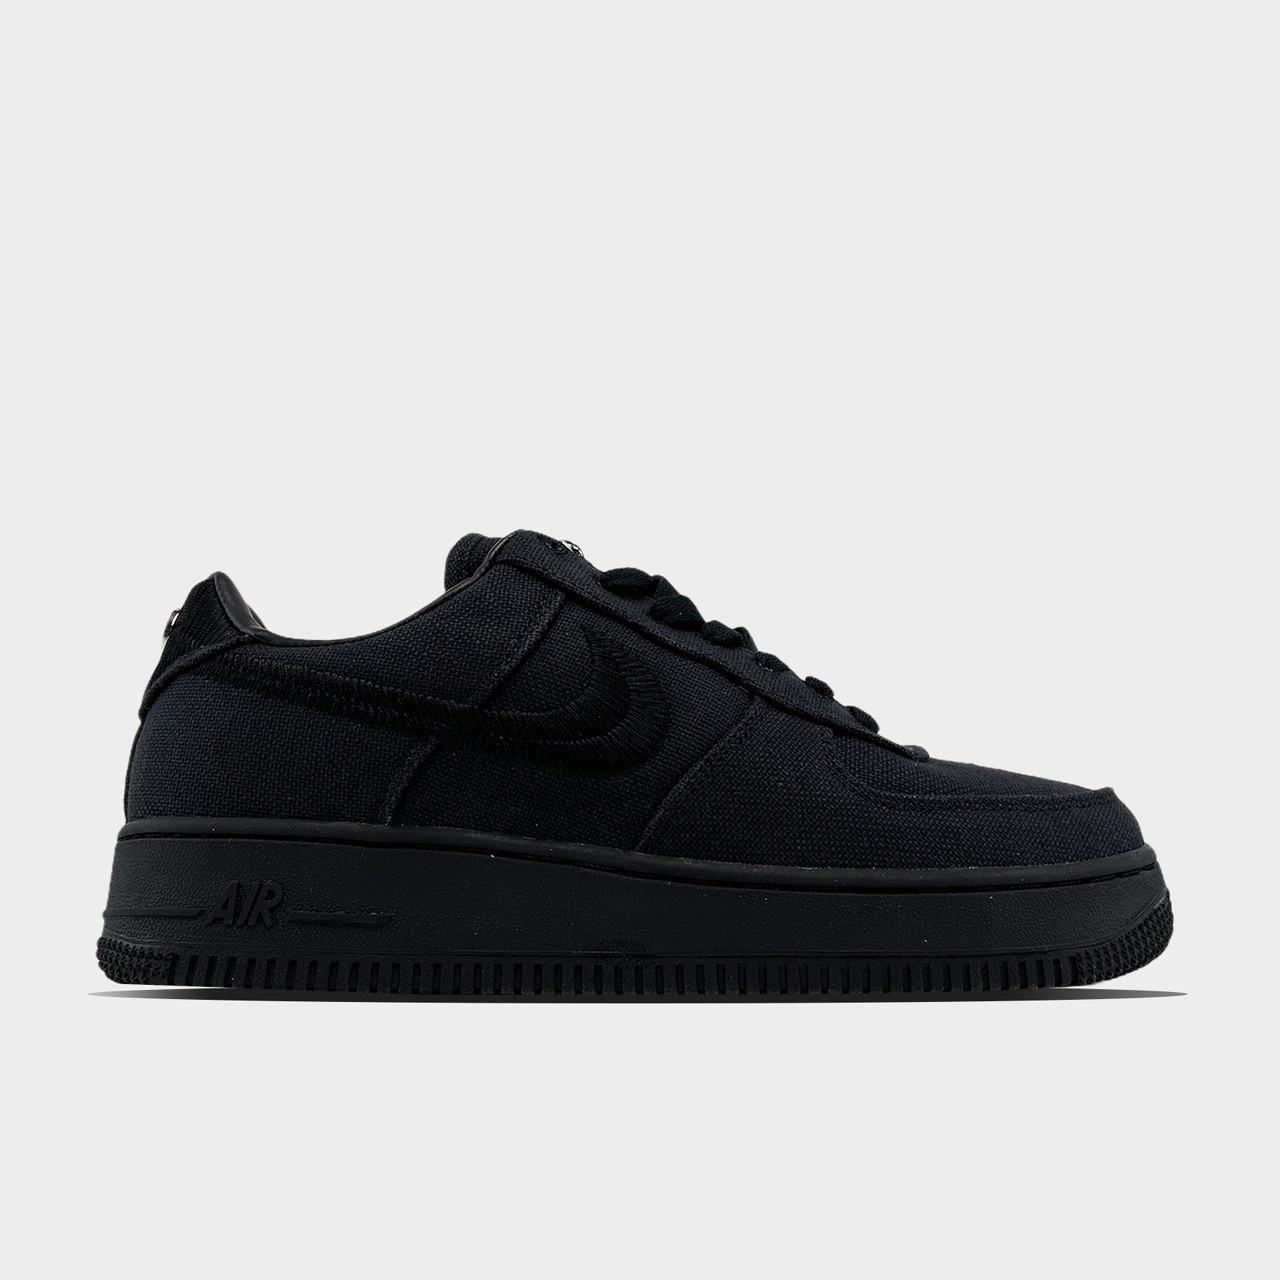 Nike Air Force 1 Low Stussy Black (Чорний)